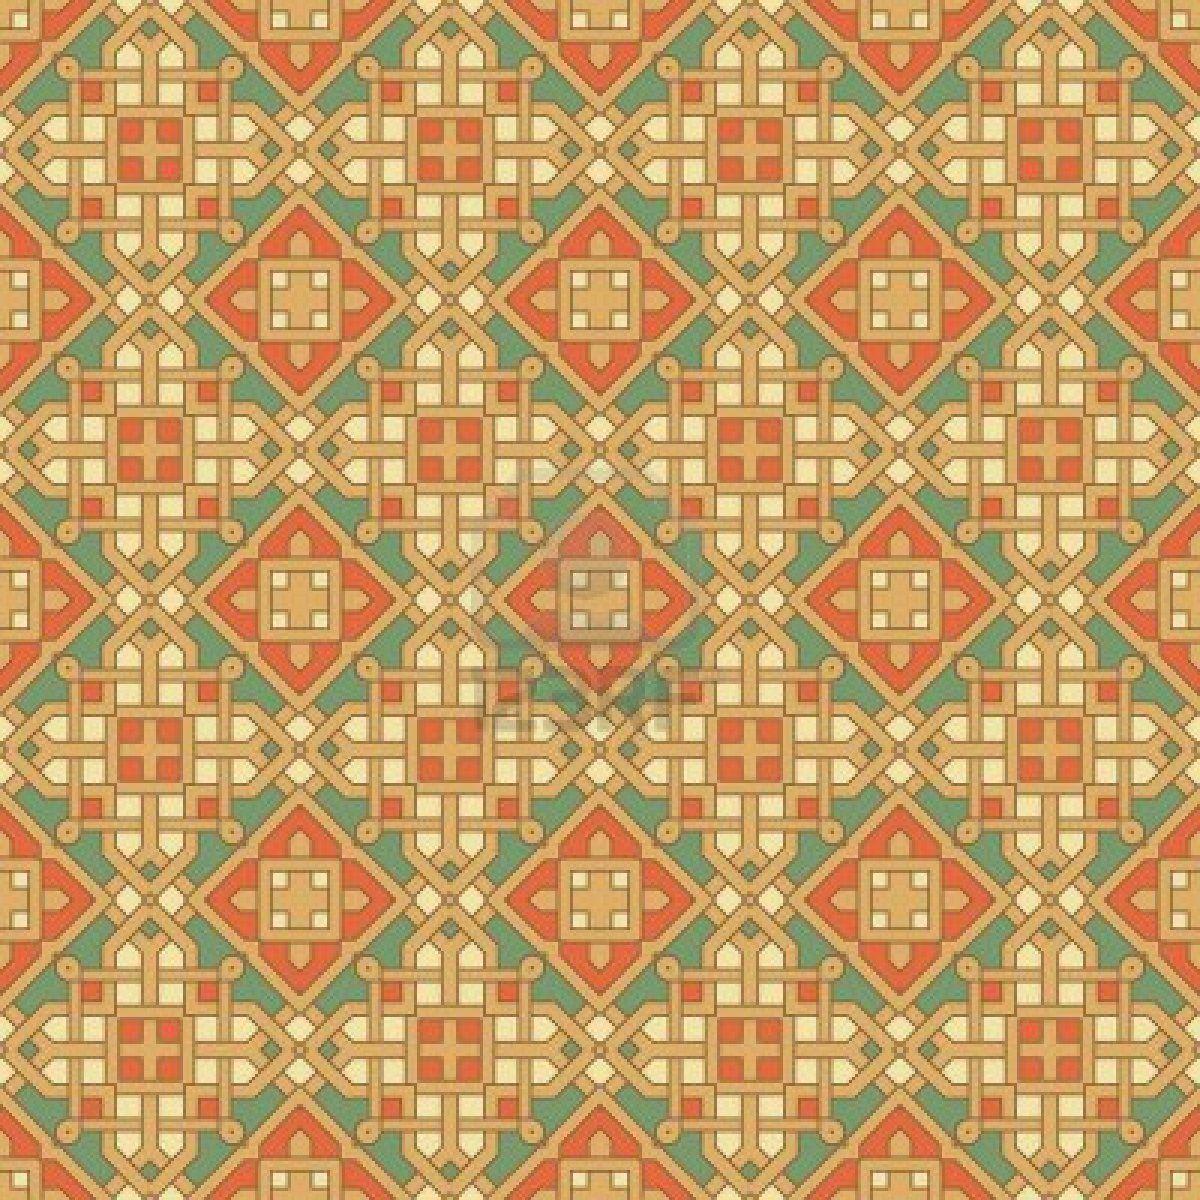 Complex Geometric Solids